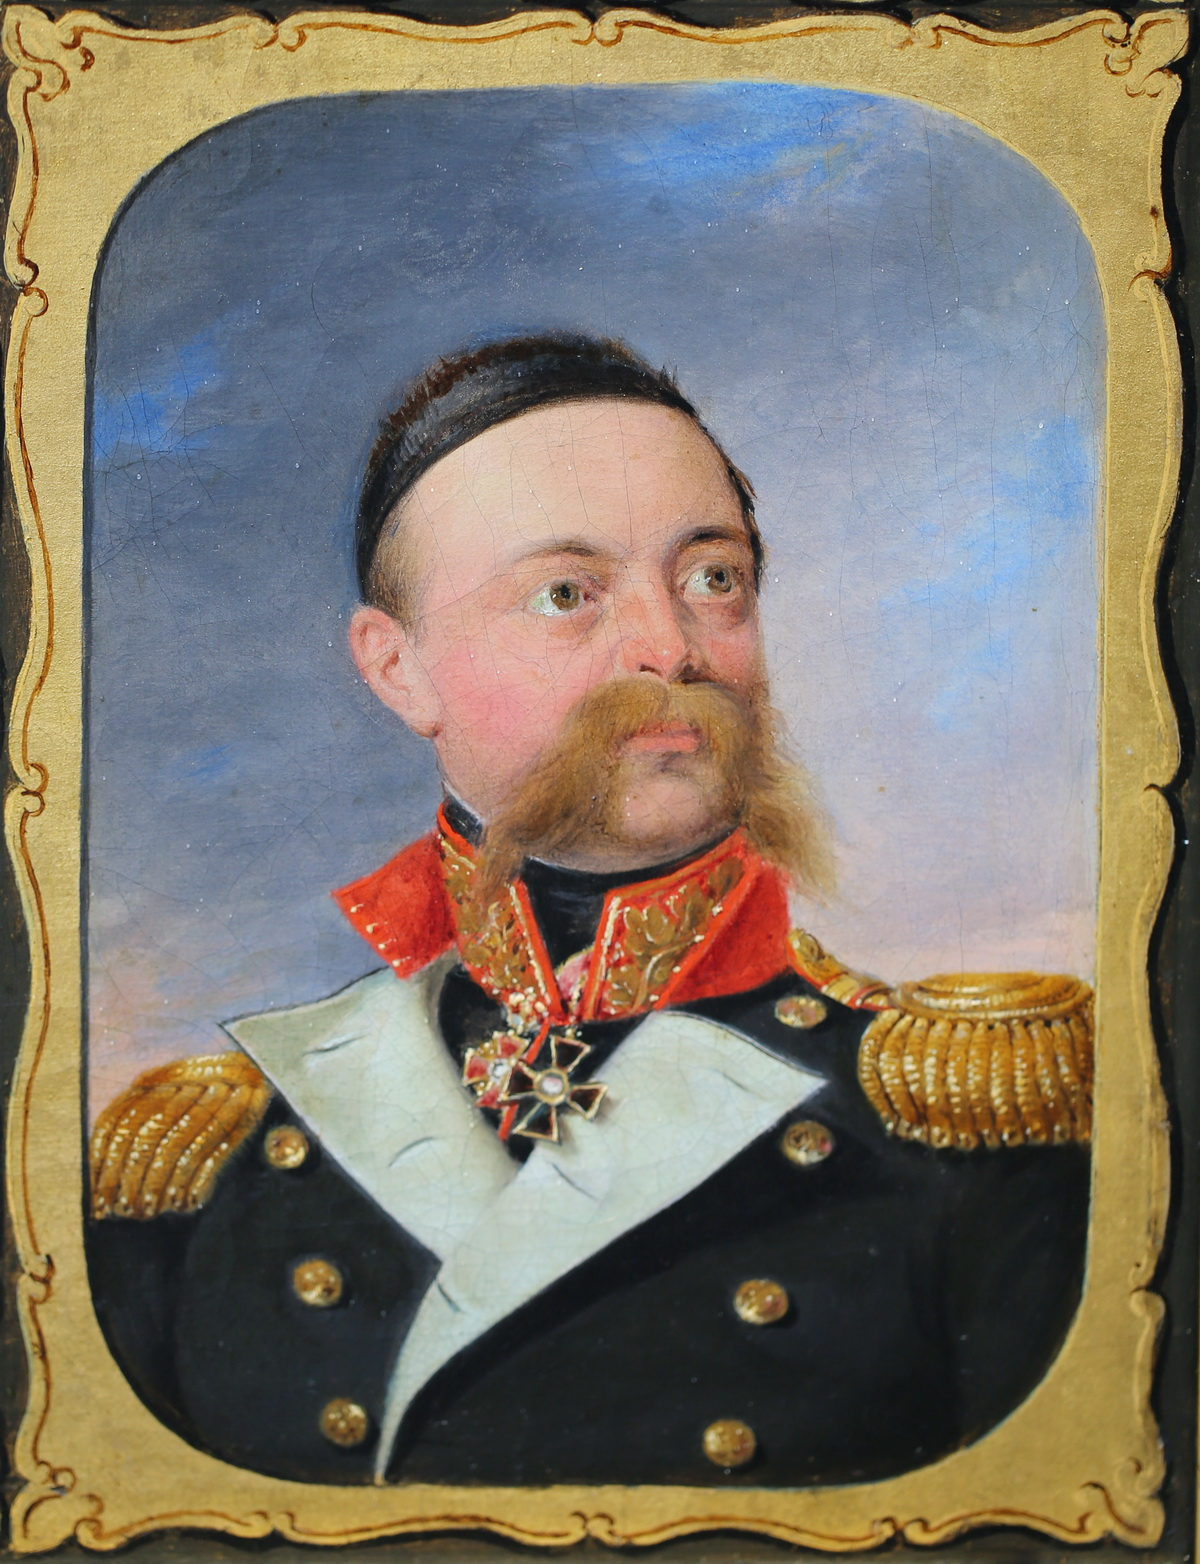 Friedrich Johann Gottlieb LIEDER 1780-1859